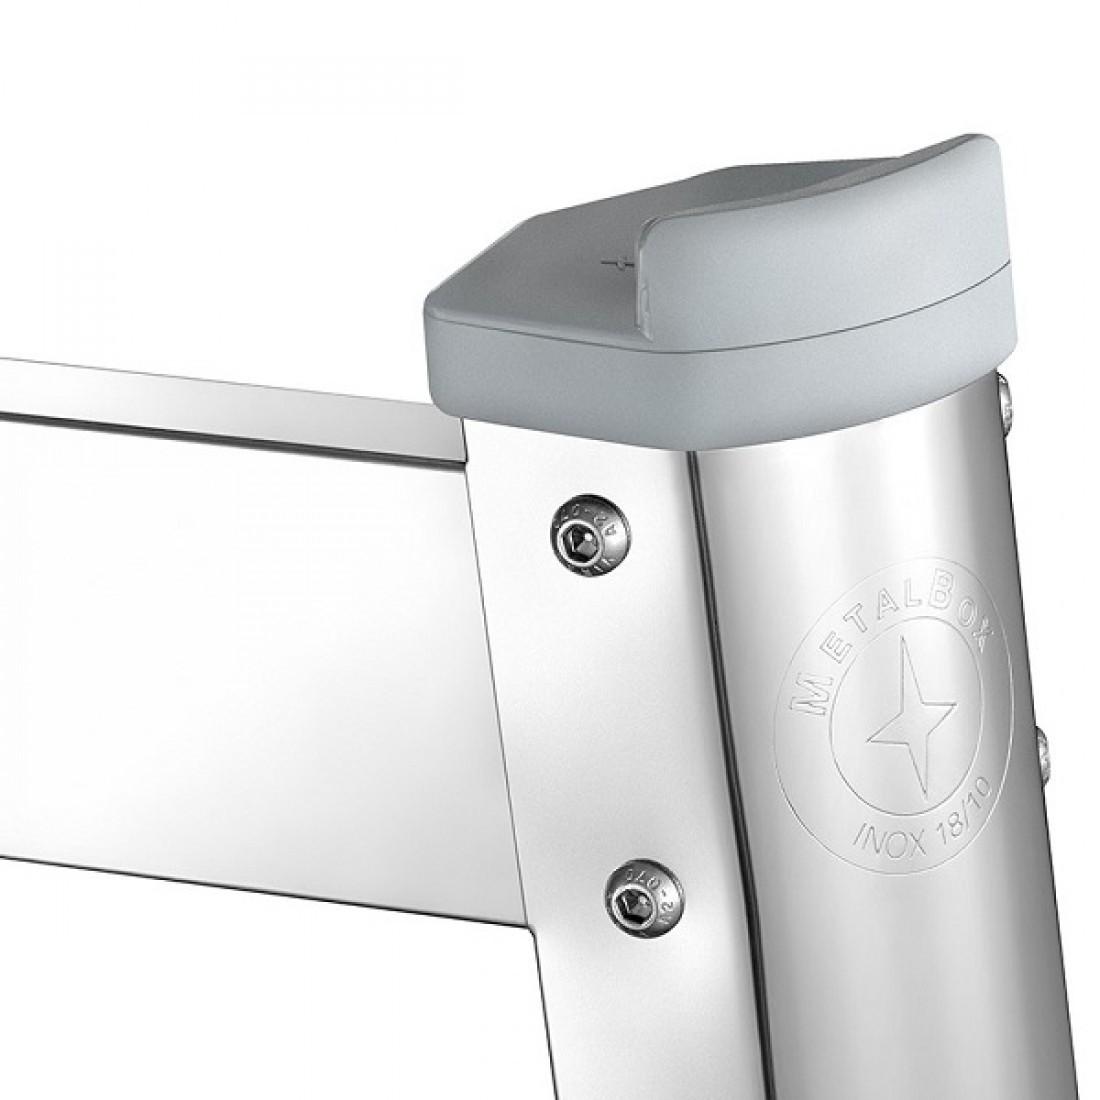 Trepied inox cu protectii din plastic MetalBox SB-52, 520 mm